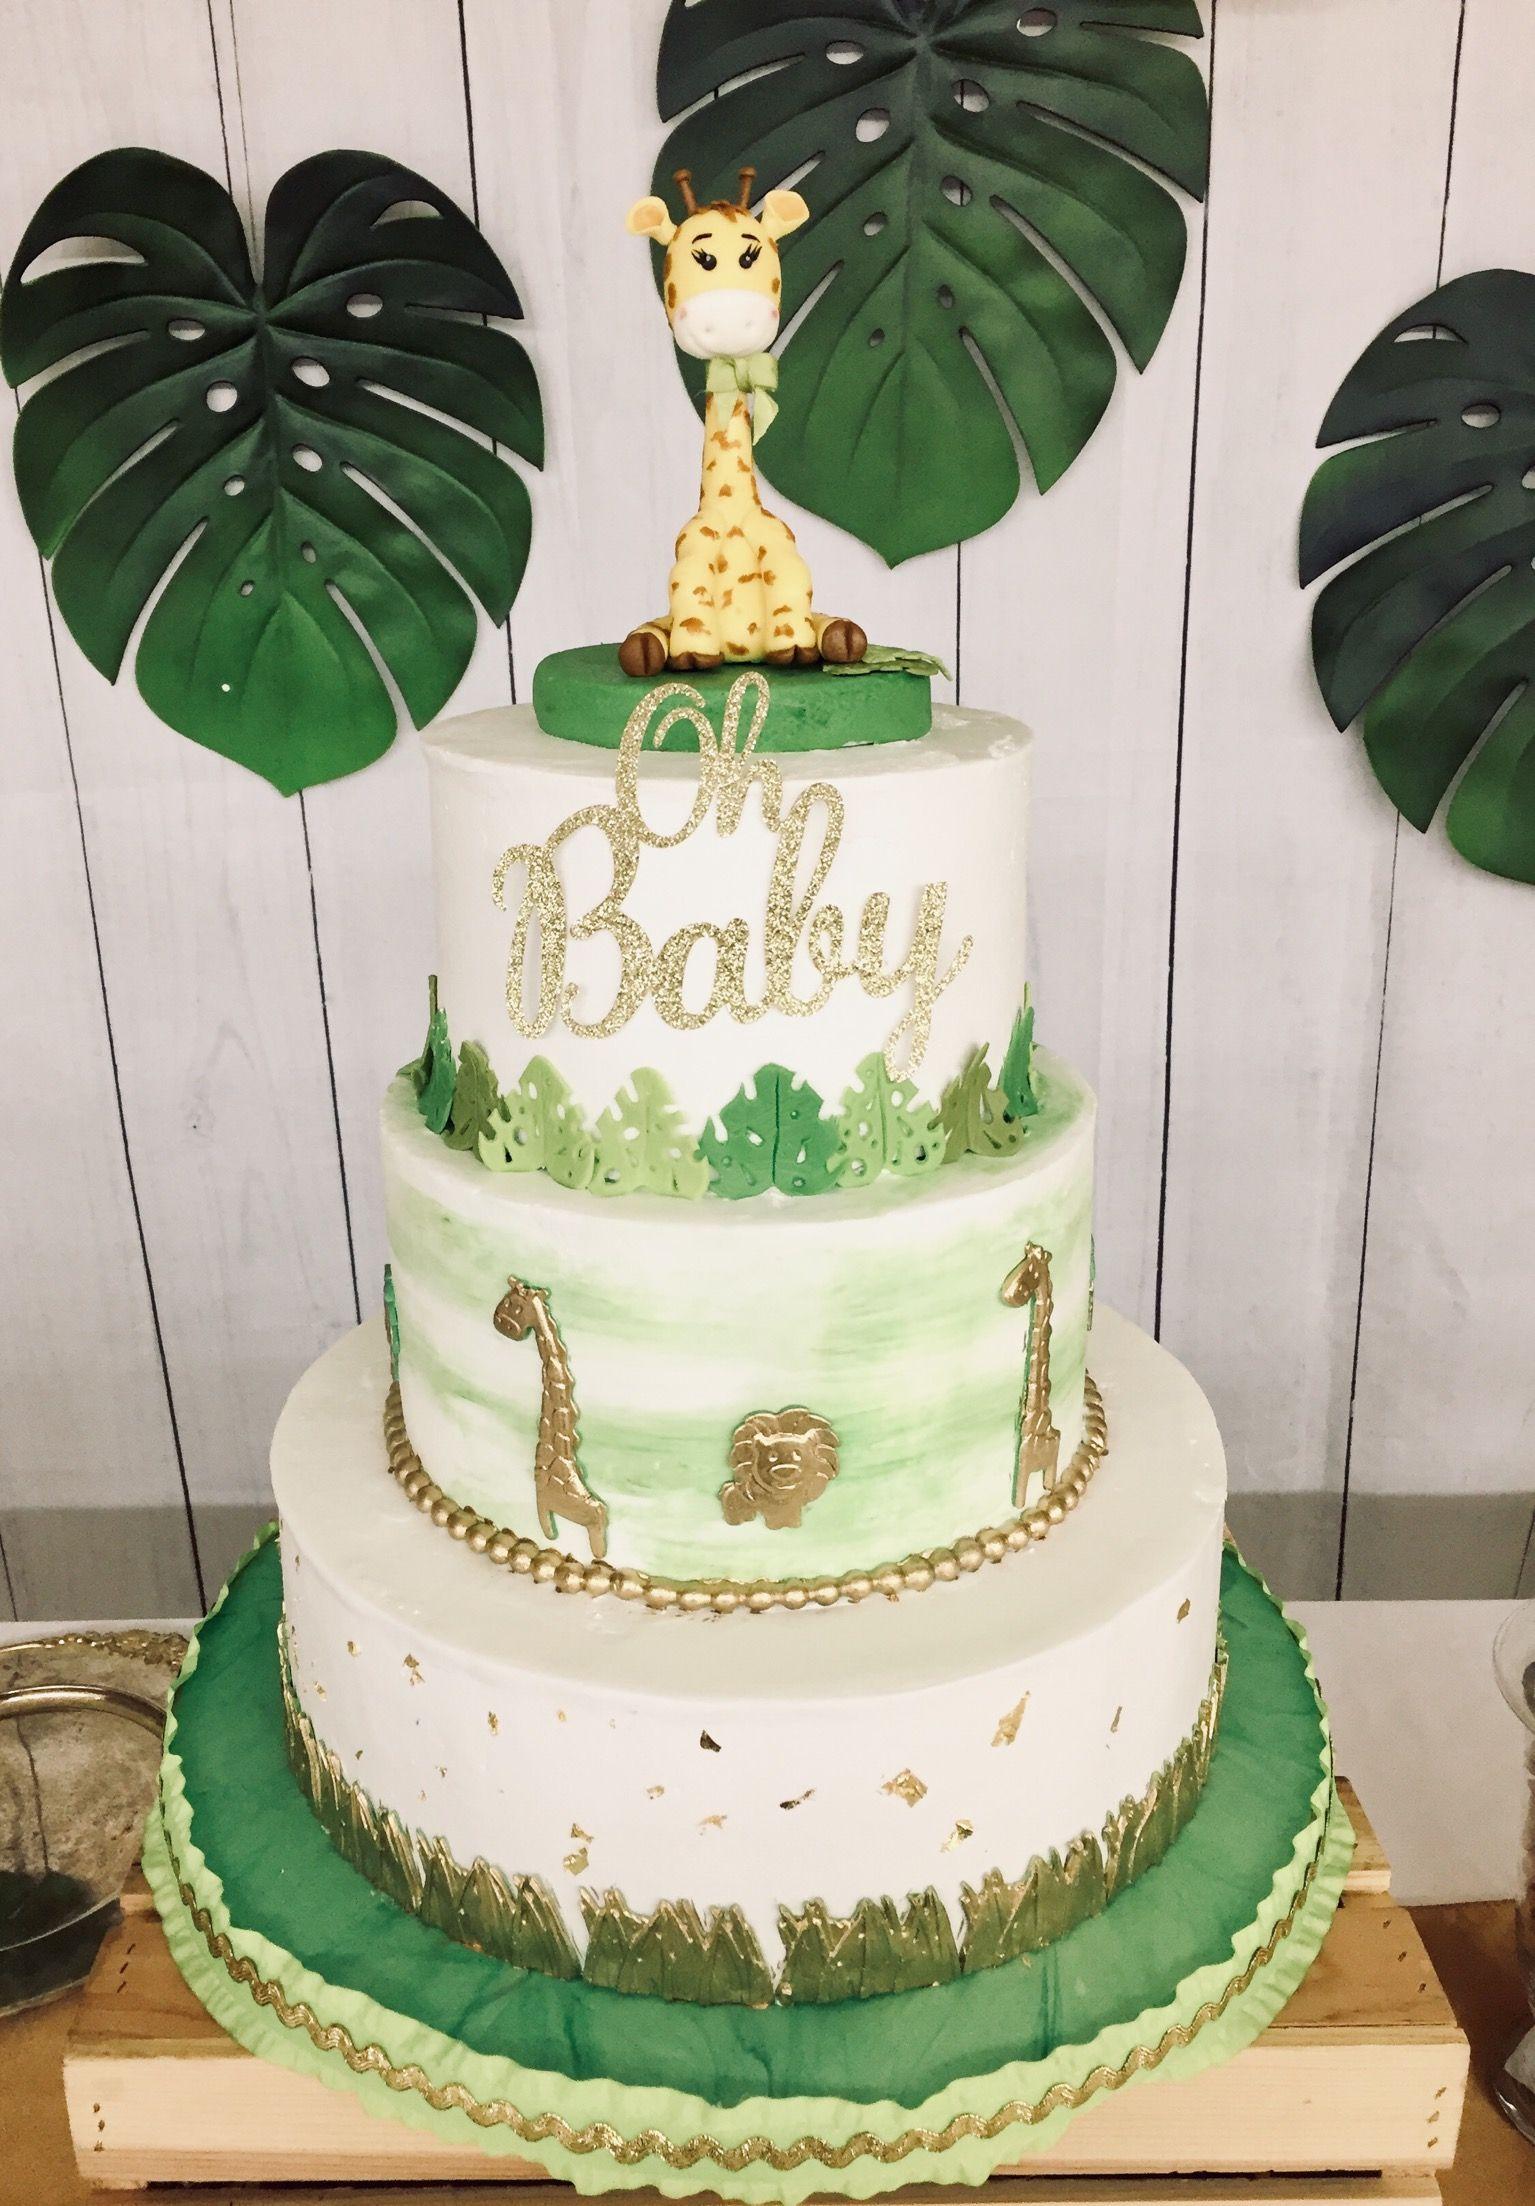 Safari Baby Shower Cake For Boy : safari, shower, Cutest, Safari, Shower, Cake!, 🦒🍃🌿🌴, #safaricake, #babyshowercake, #cakeforbabyshower, #it…, Cake,, Giraffe,, Jungle